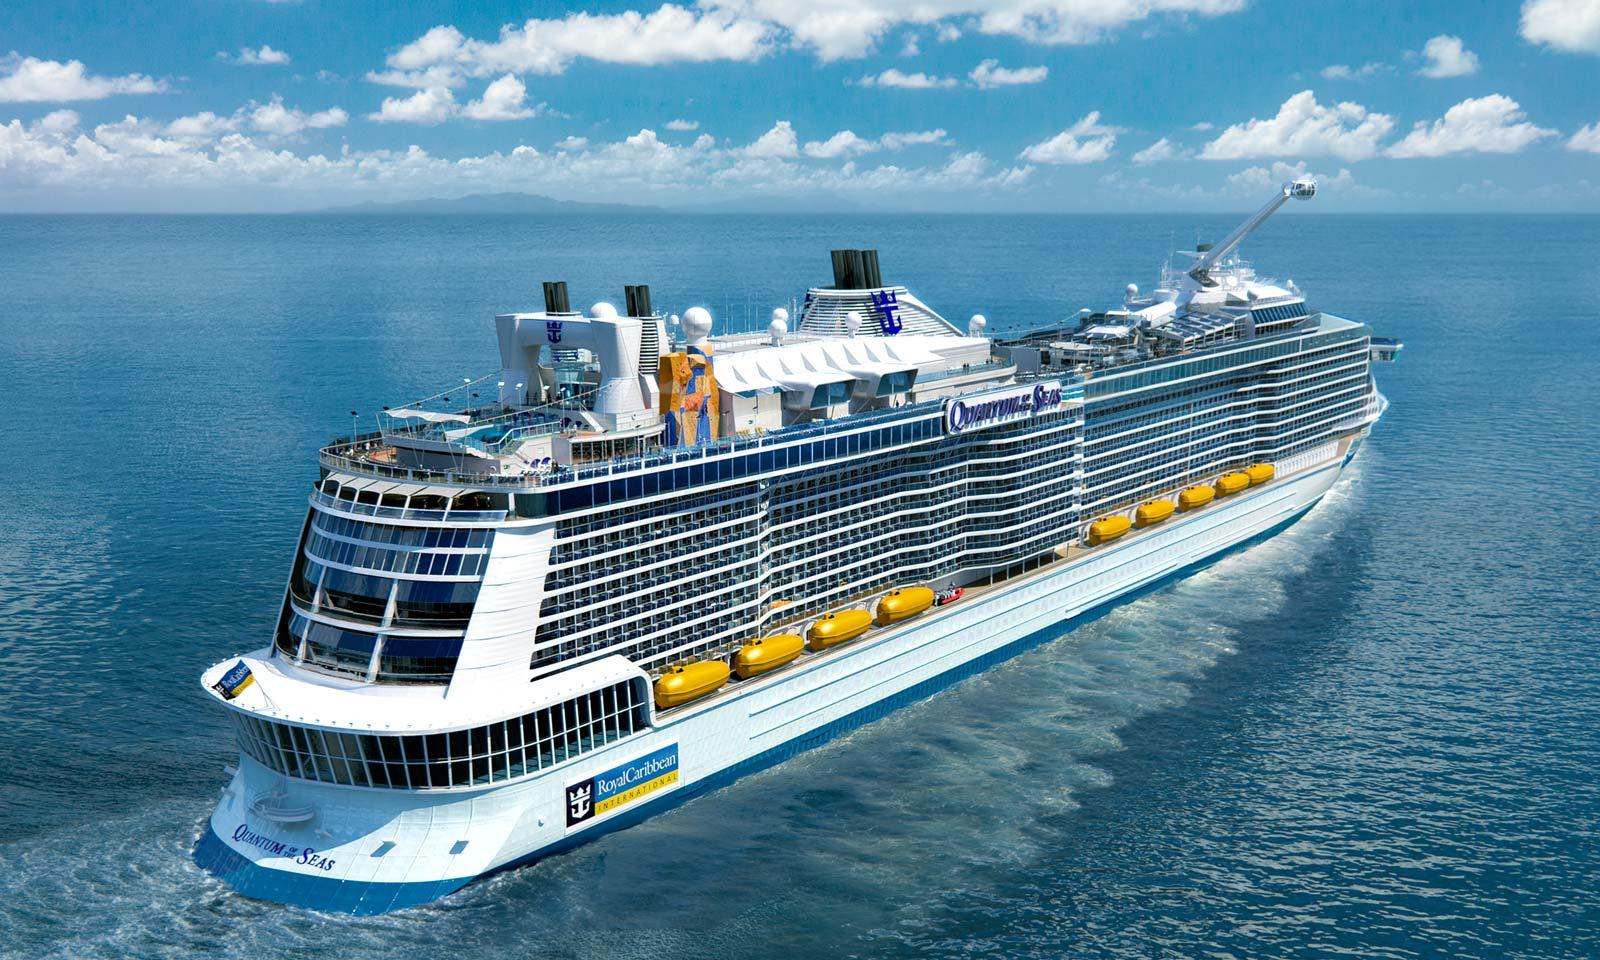 Cruceros por Islas Canarias